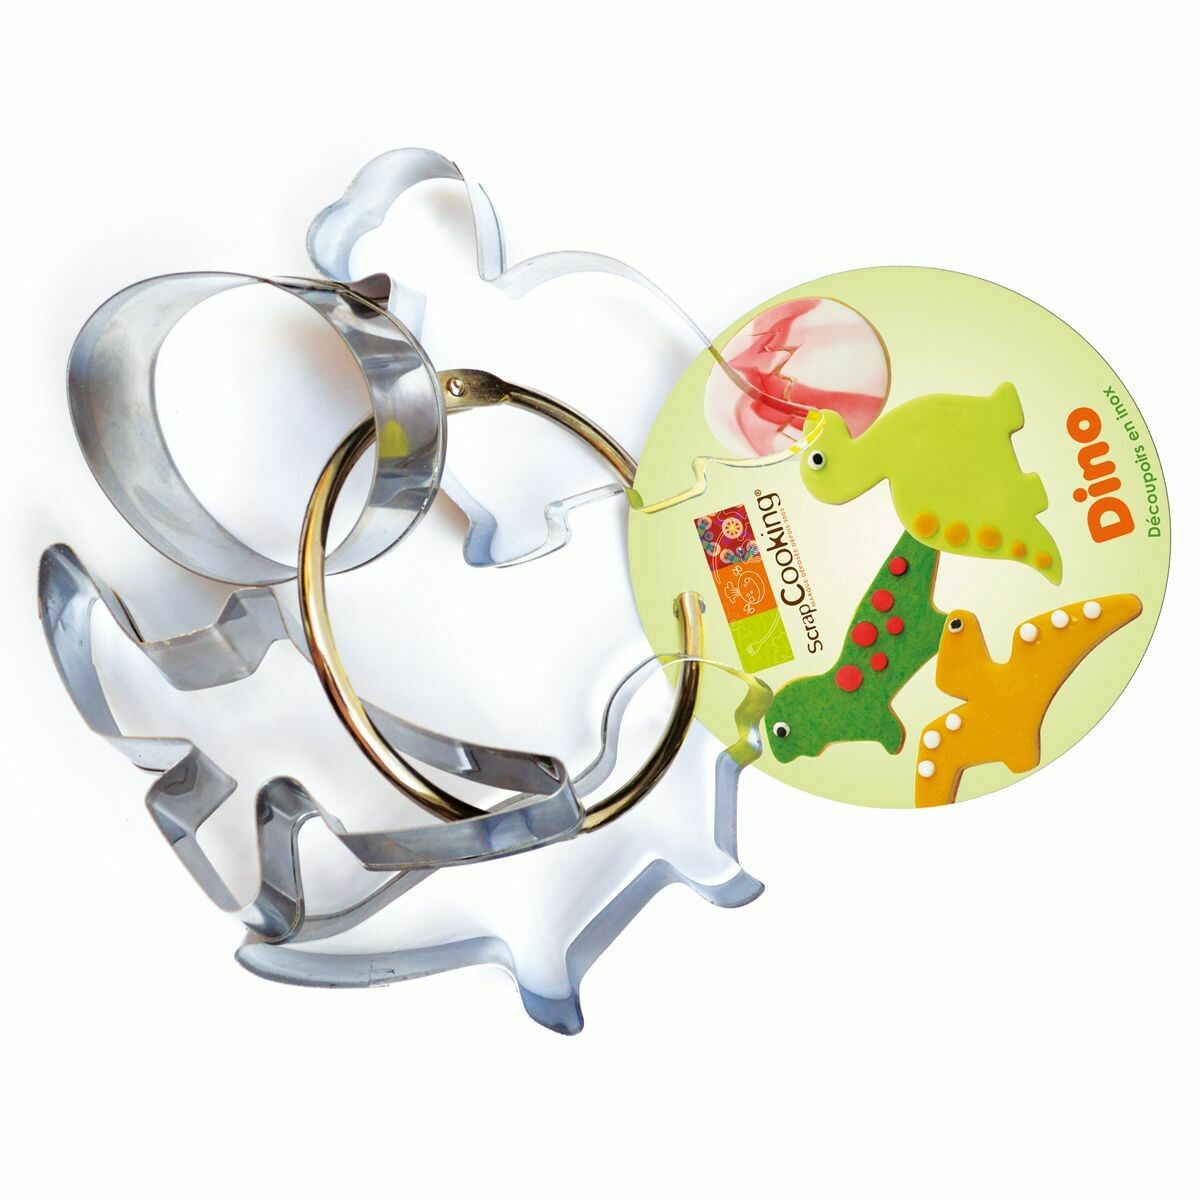 ScrapCooking Set of 4 Cookie Cutters -CUTE DINOSAUR & EGG SET - Σετ 4τεμ κουπ πατ Δεινόσαυροι και Αυγό